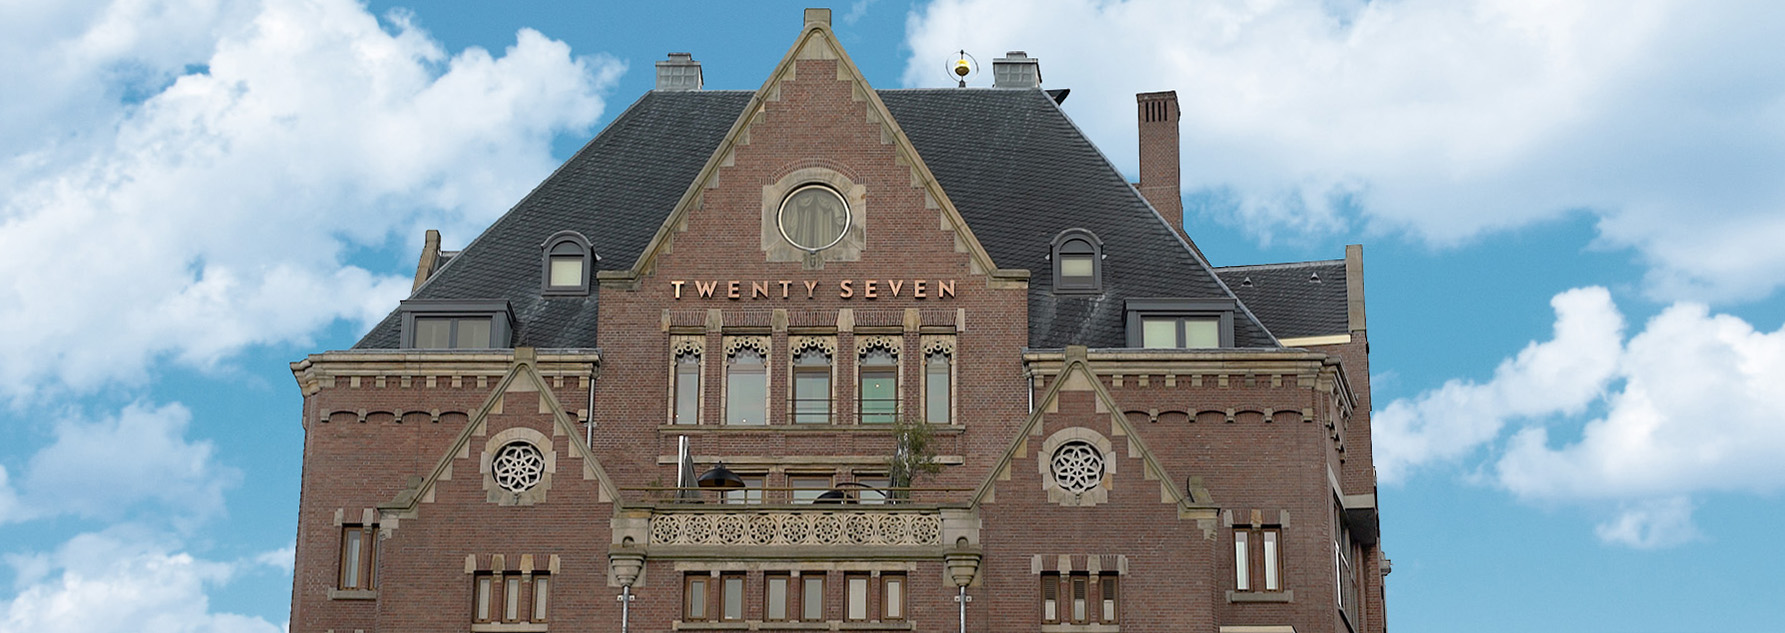 Hotel Twentyseven Amsterdam outside